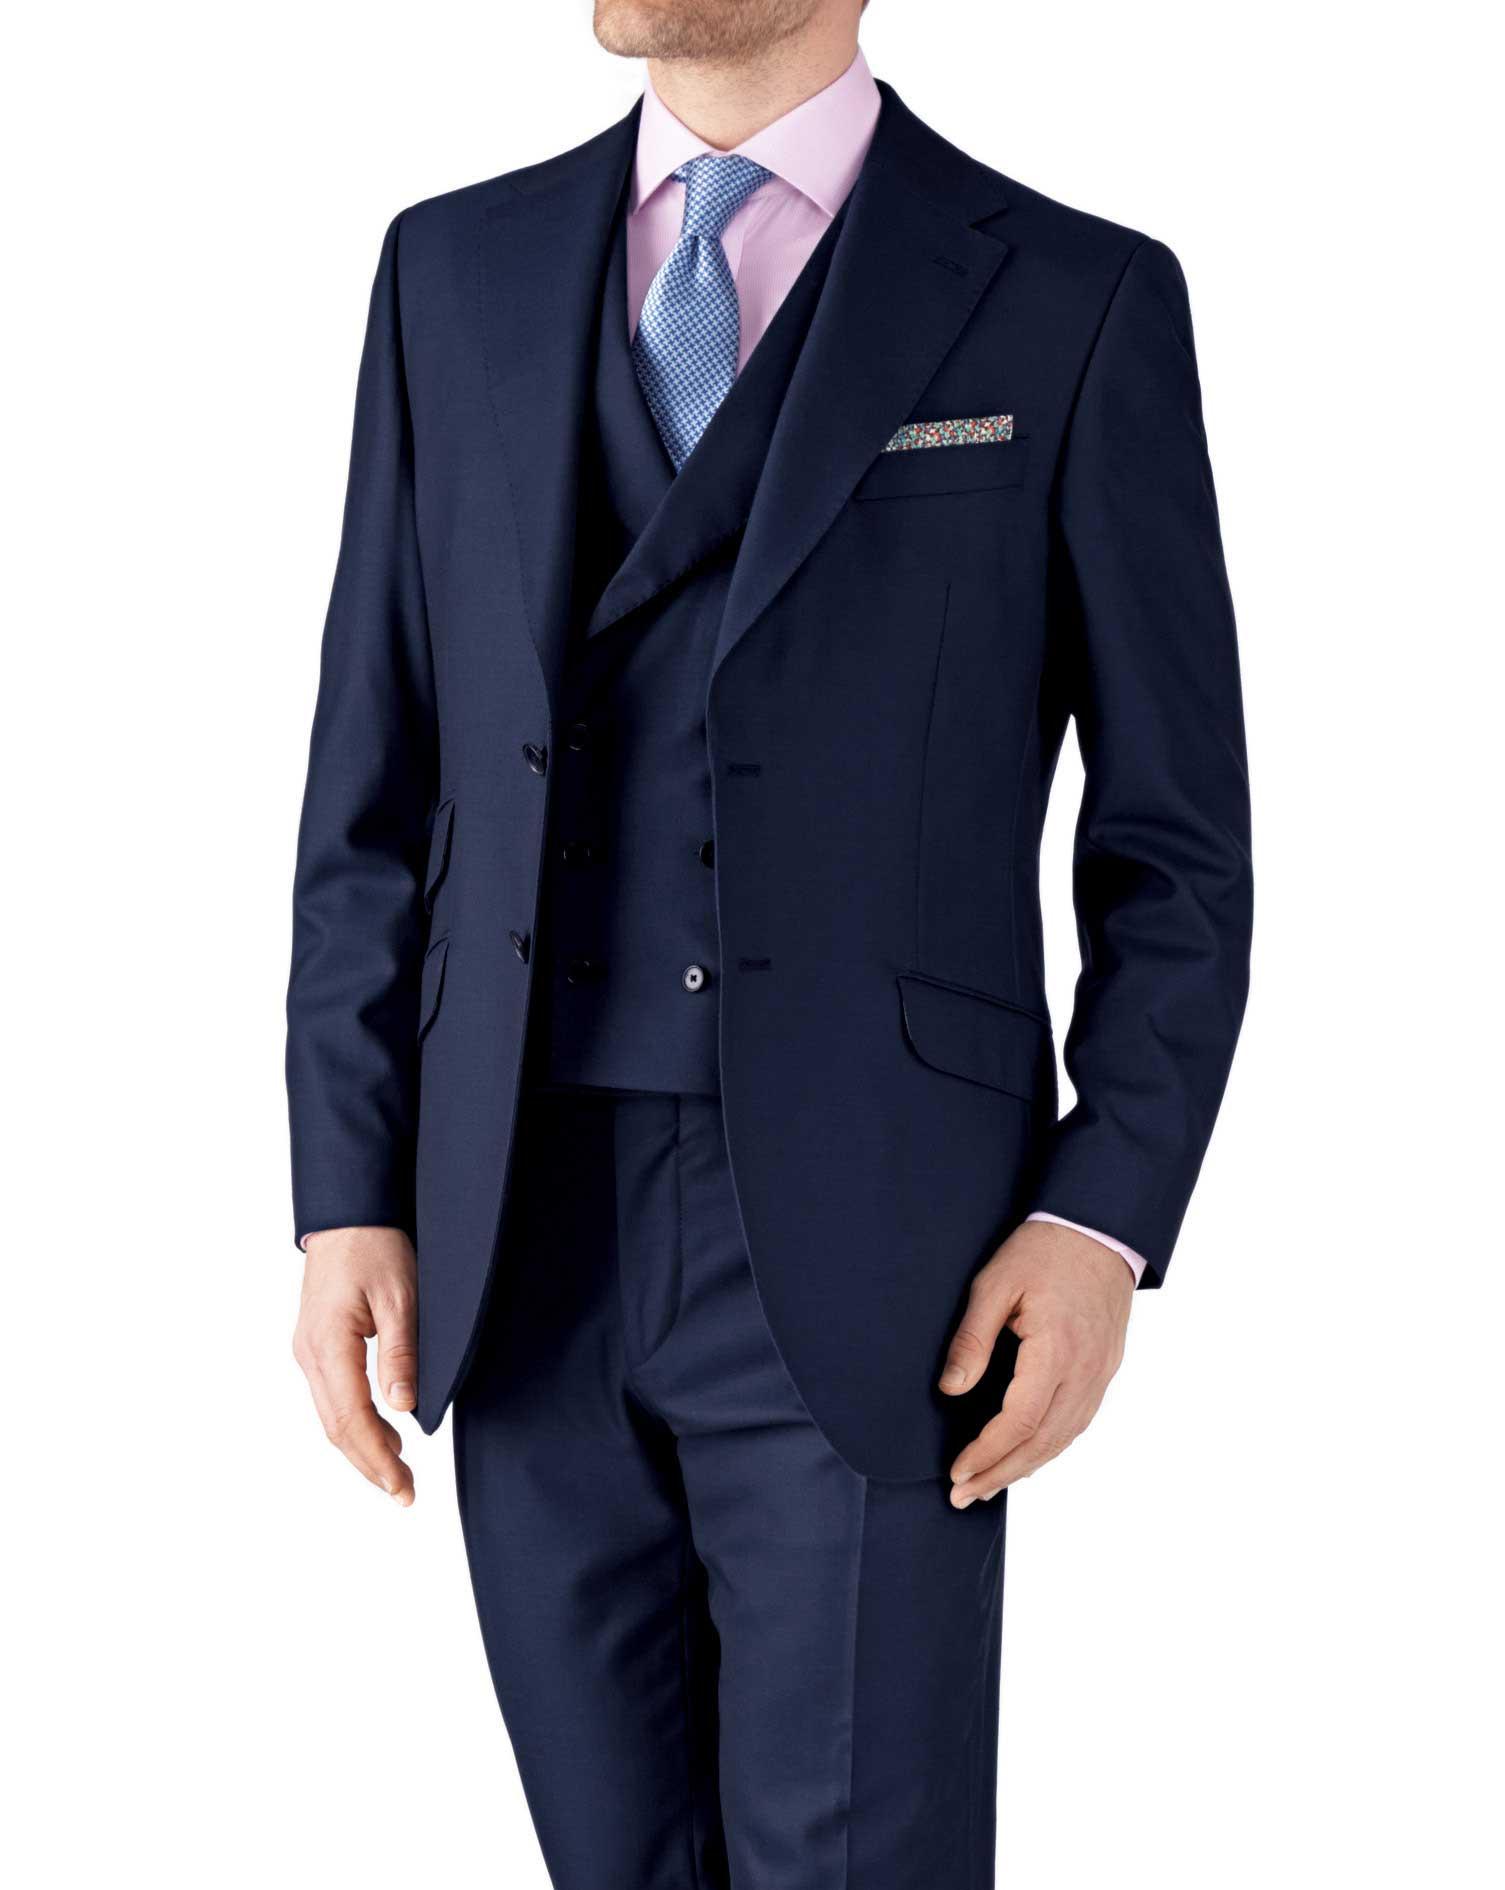 Navy Classic Fit British Panama Luxury Suit Wool Jacket Size 40 Short by Charles Tyrwhitt